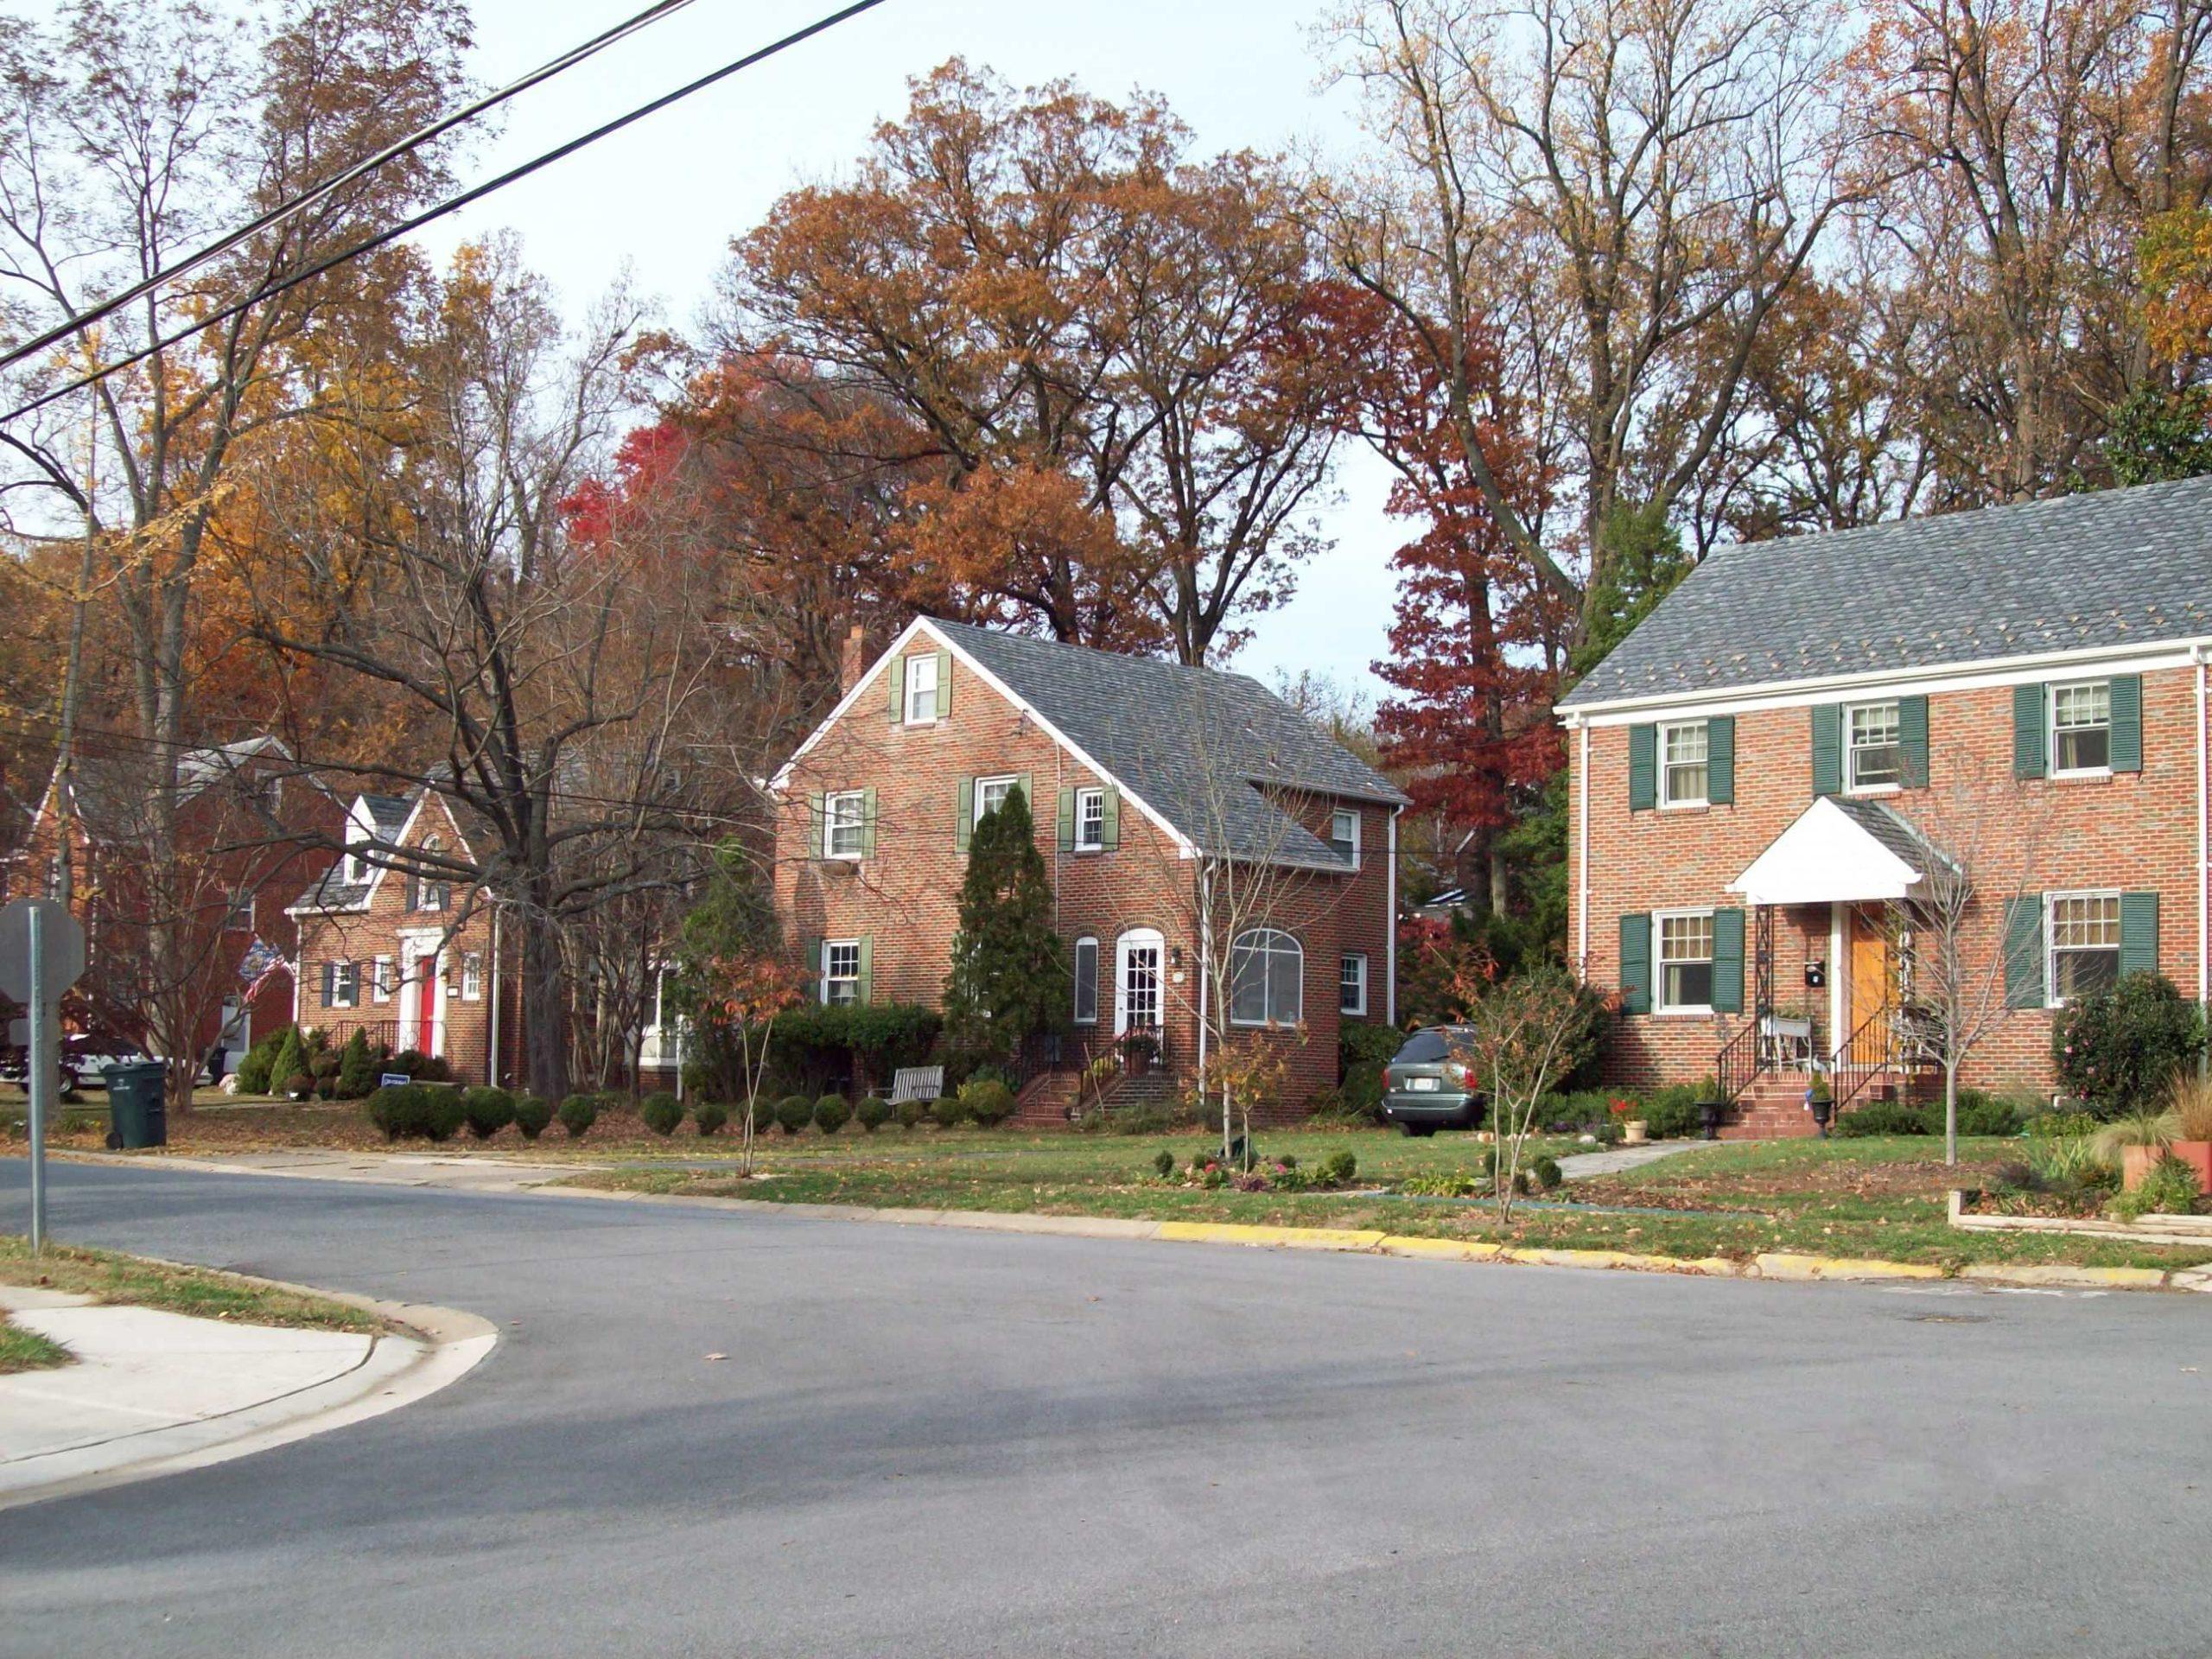 University Park - Prince George's County, Maryland